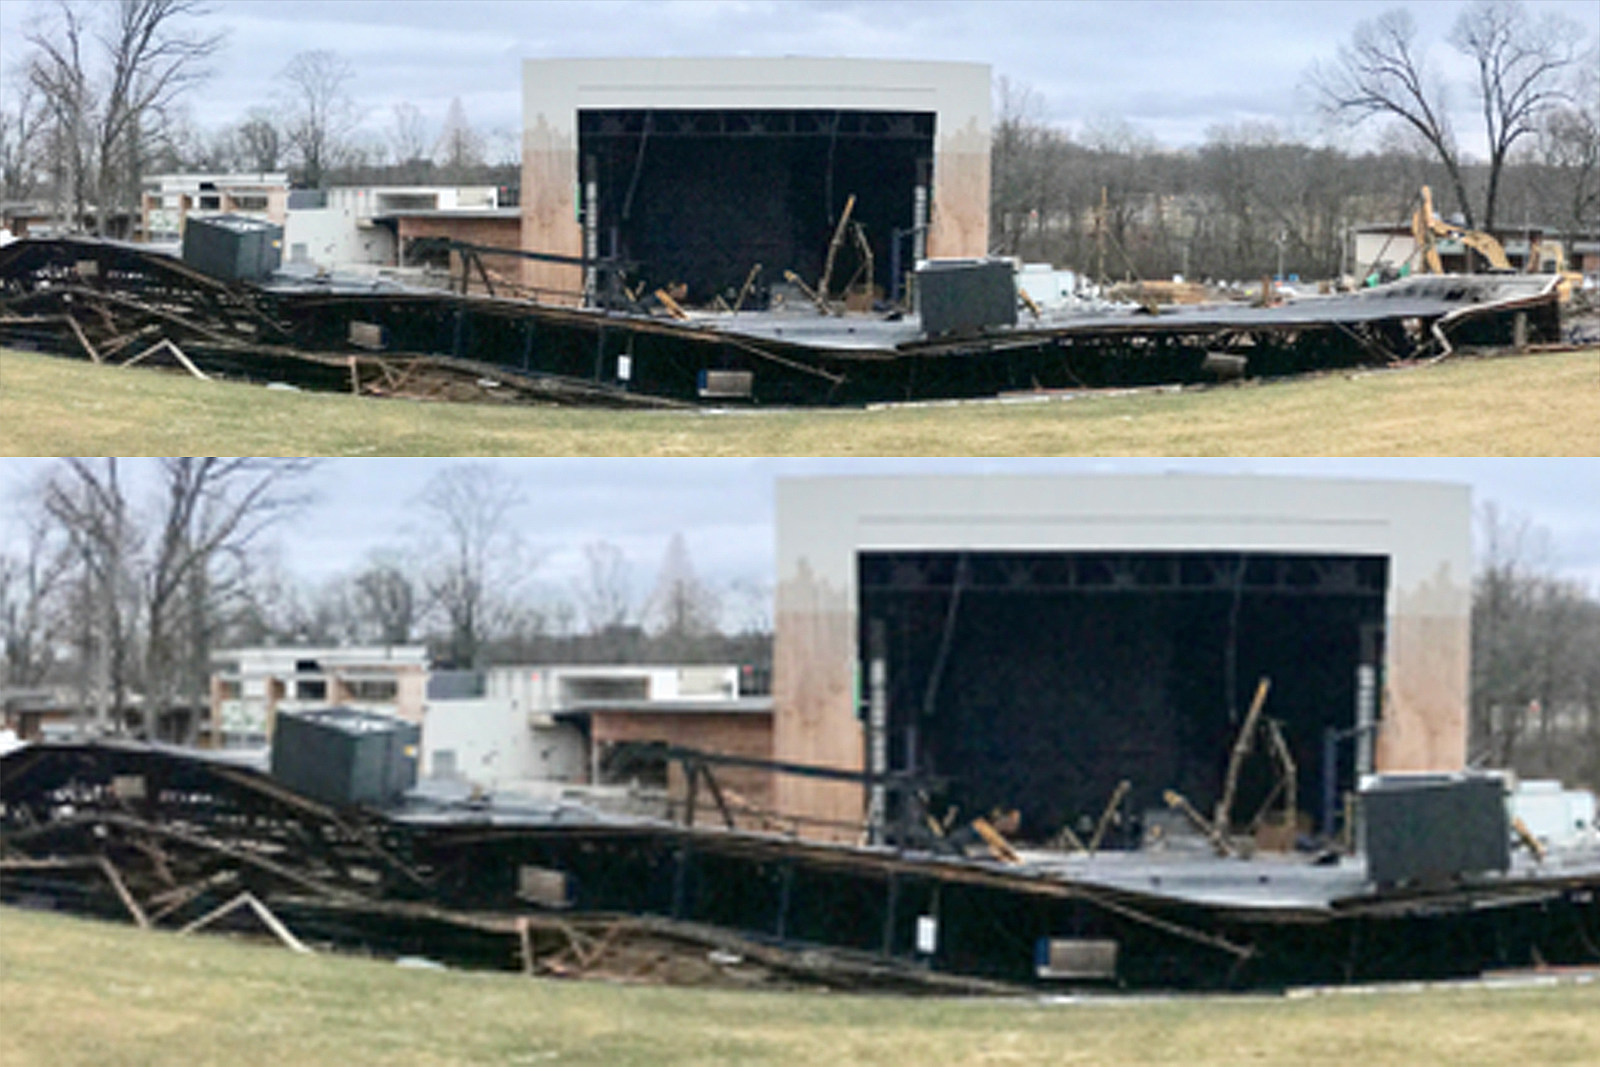 Merriweather Post Pavilion Roof Collapses